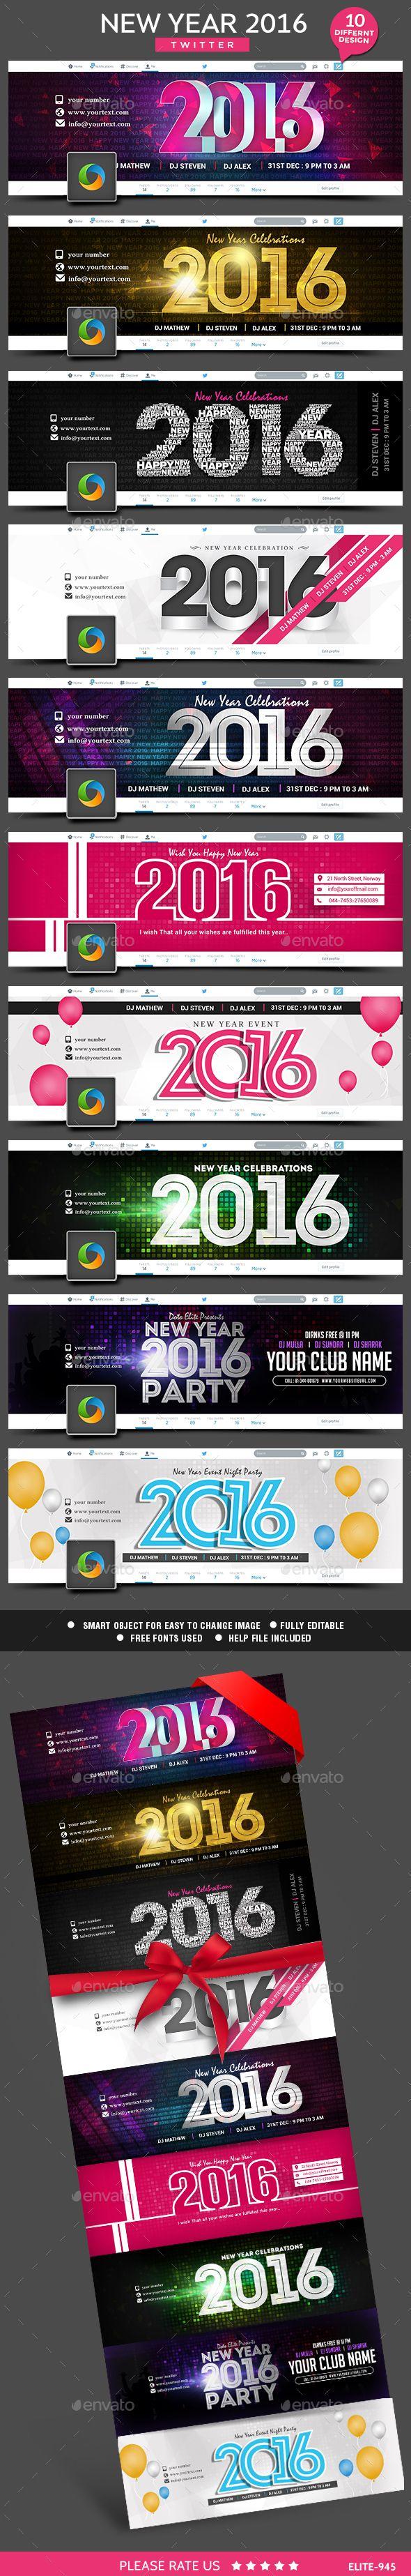 New Year Twitter Headers 10 Designs Twitter Template Twitter Header Webpage Design